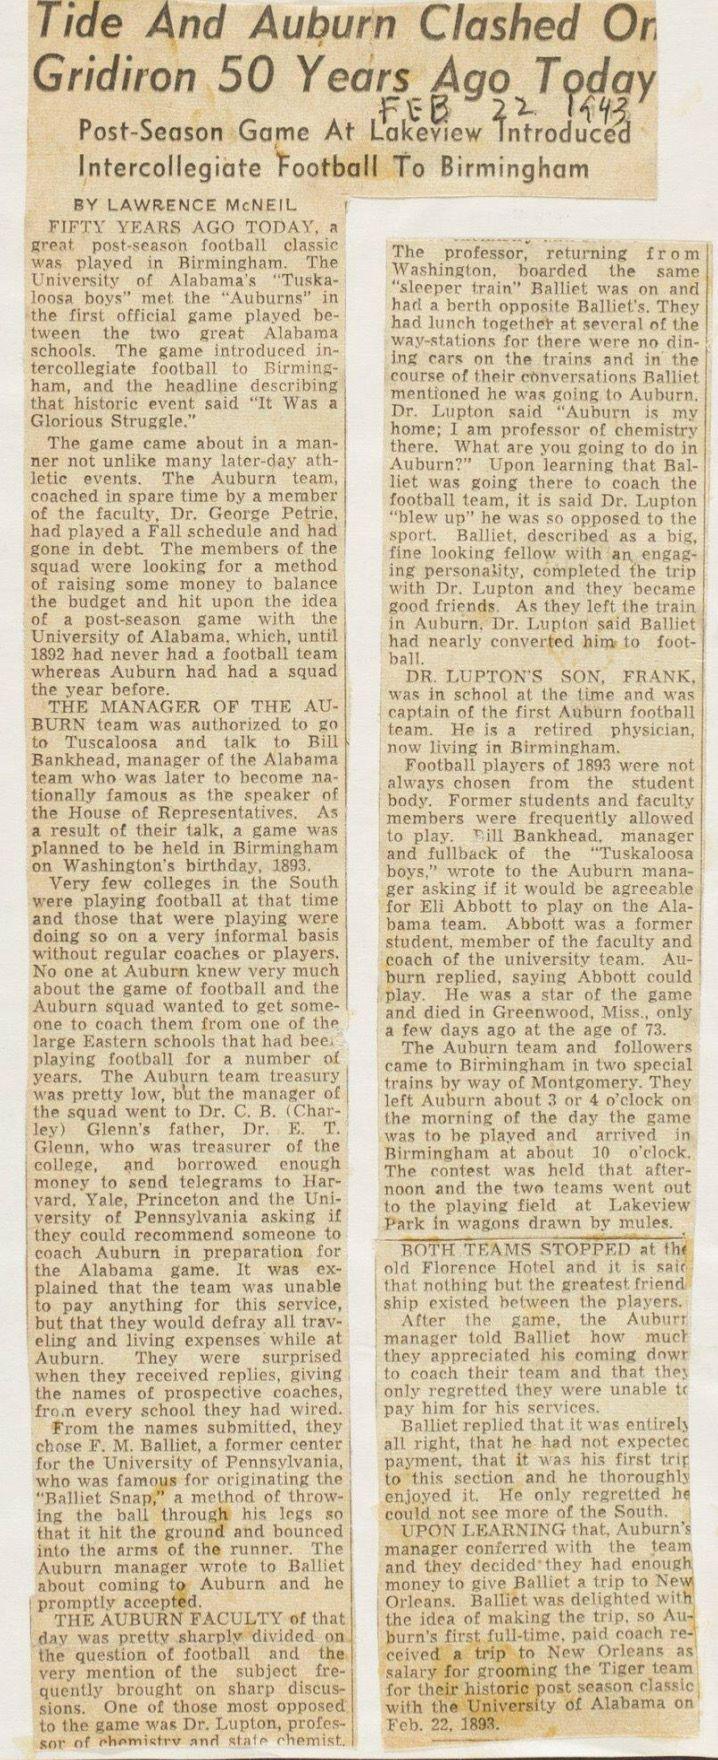 1943 Newspaper article about the Alabama vs Auburn game 50 years prior   #Alabama #RollTide #Bama #BuiltByBama #RTR #CrimsonTide #RammerJammer